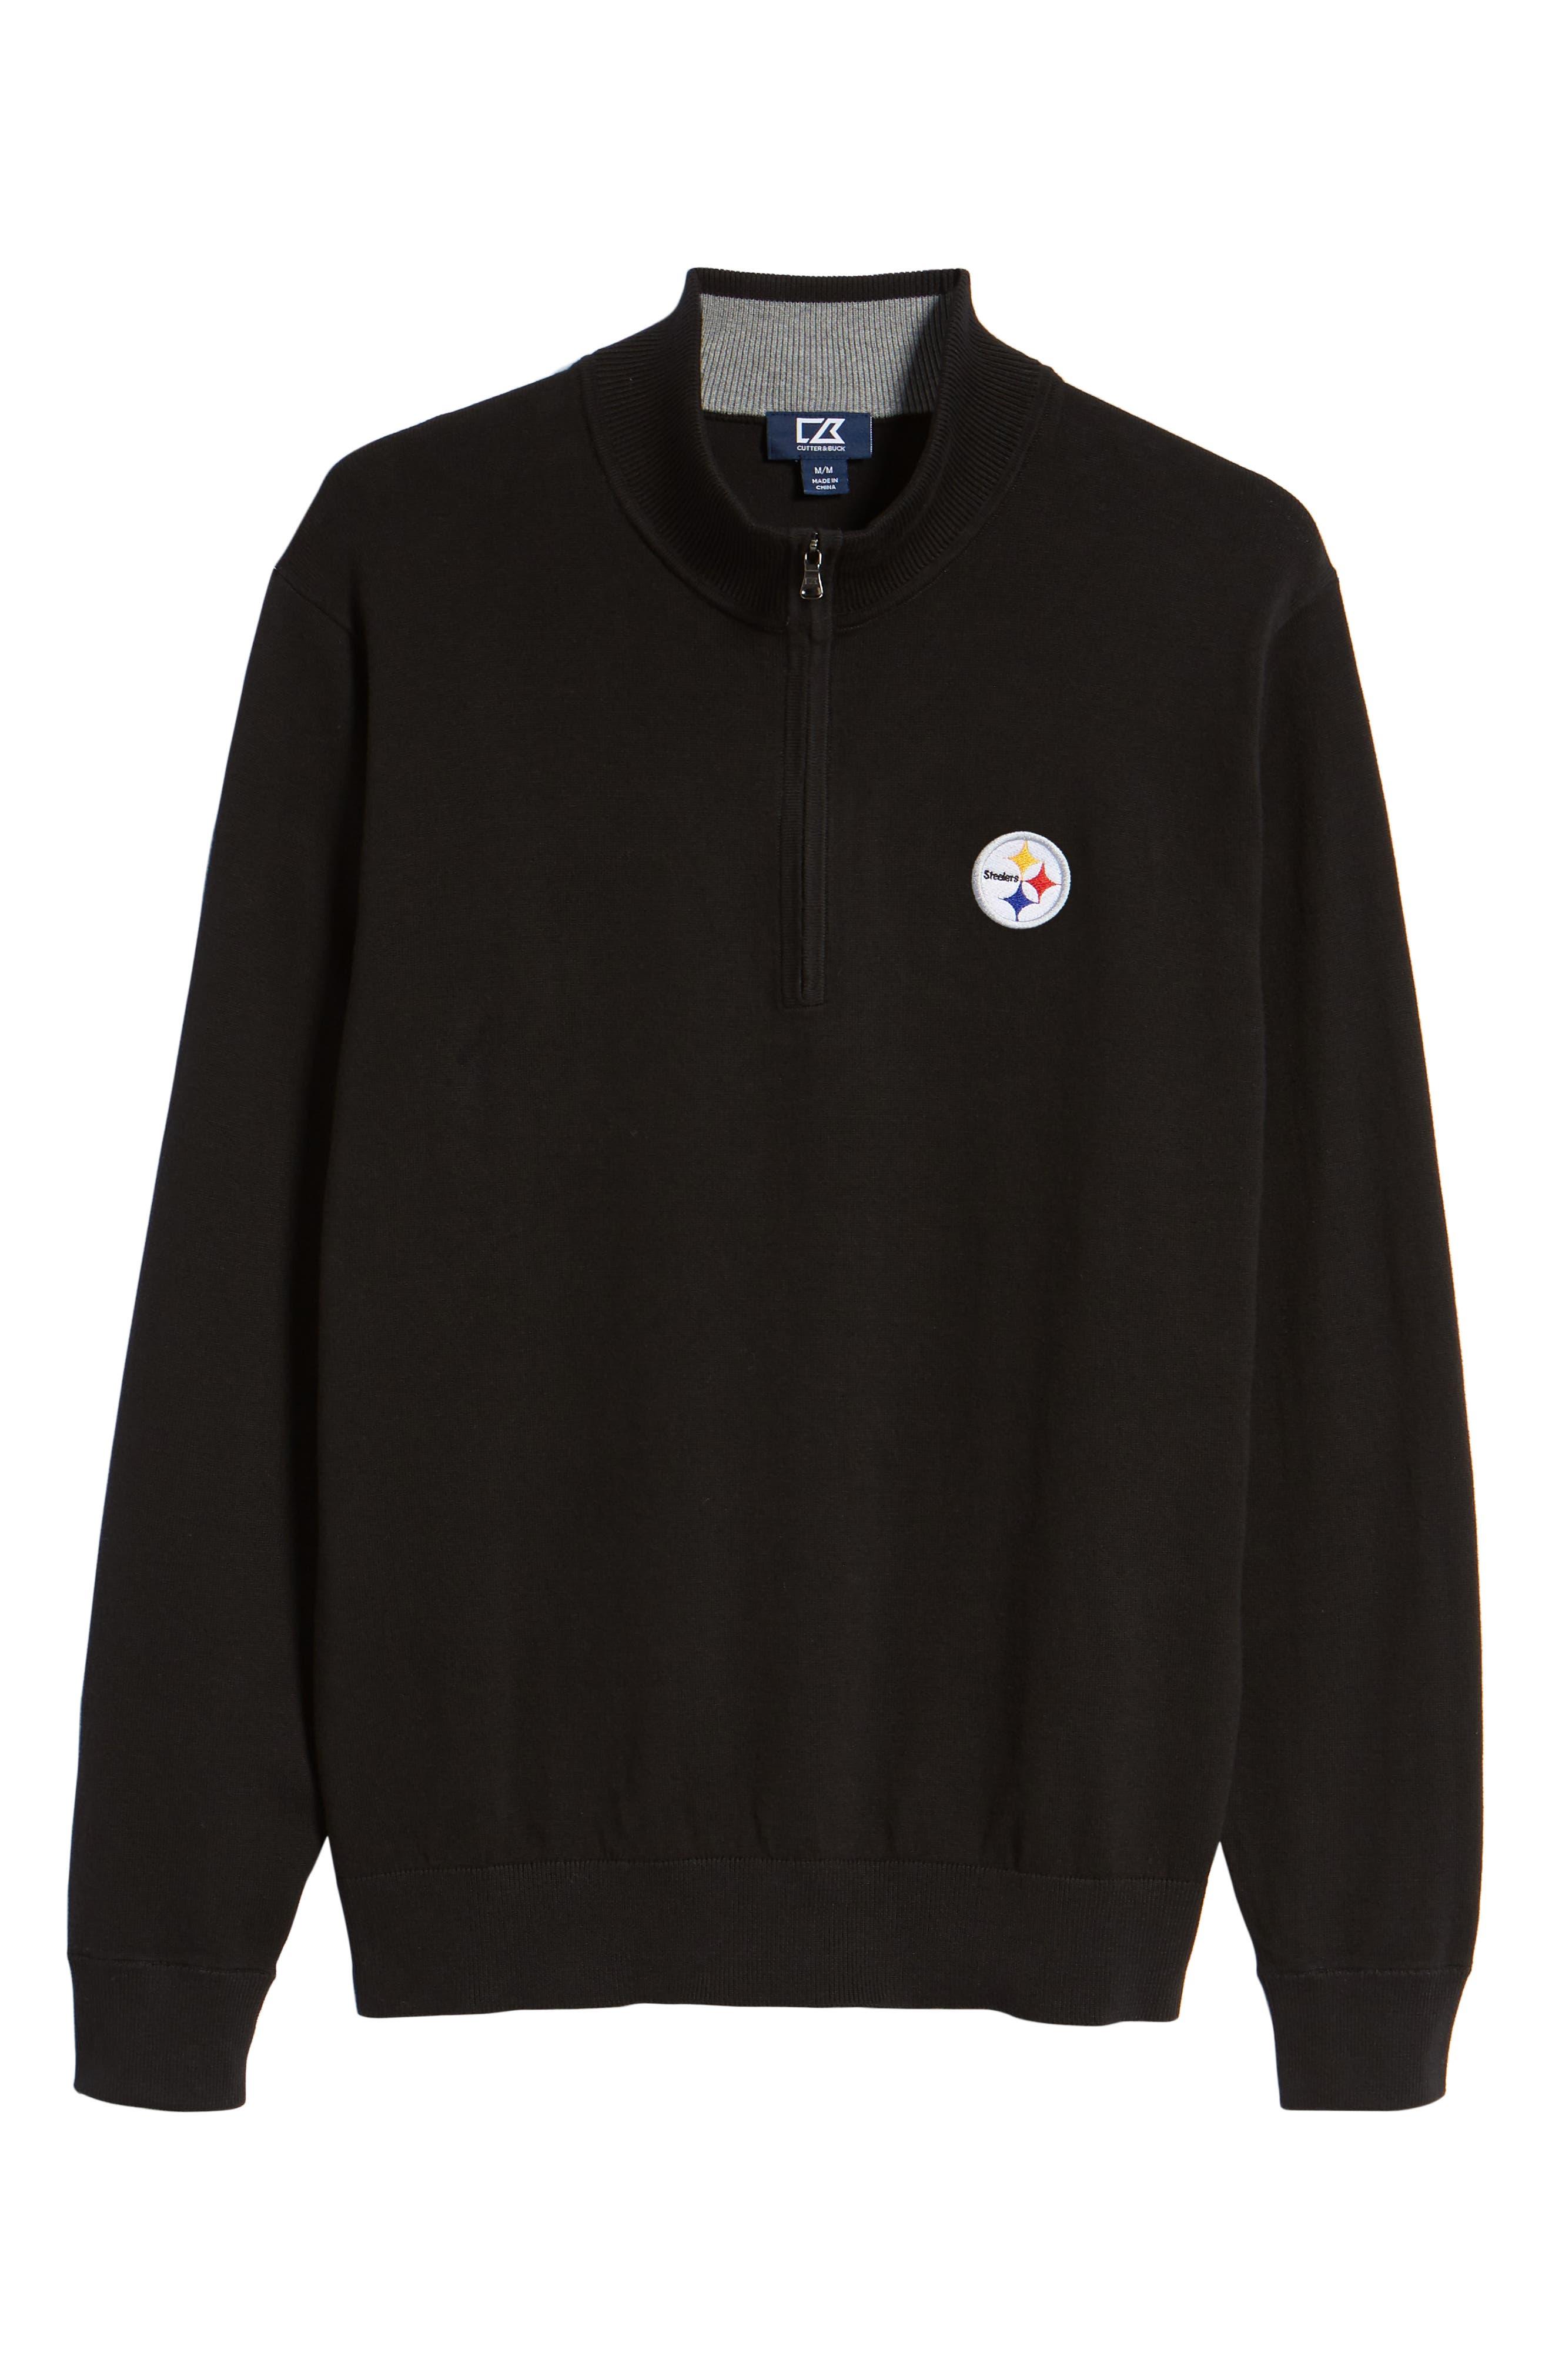 Pittsburgh Steelers - Lakemont Regular Fit Half Zip Sweater,                             Alternate thumbnail 6, color,                             001